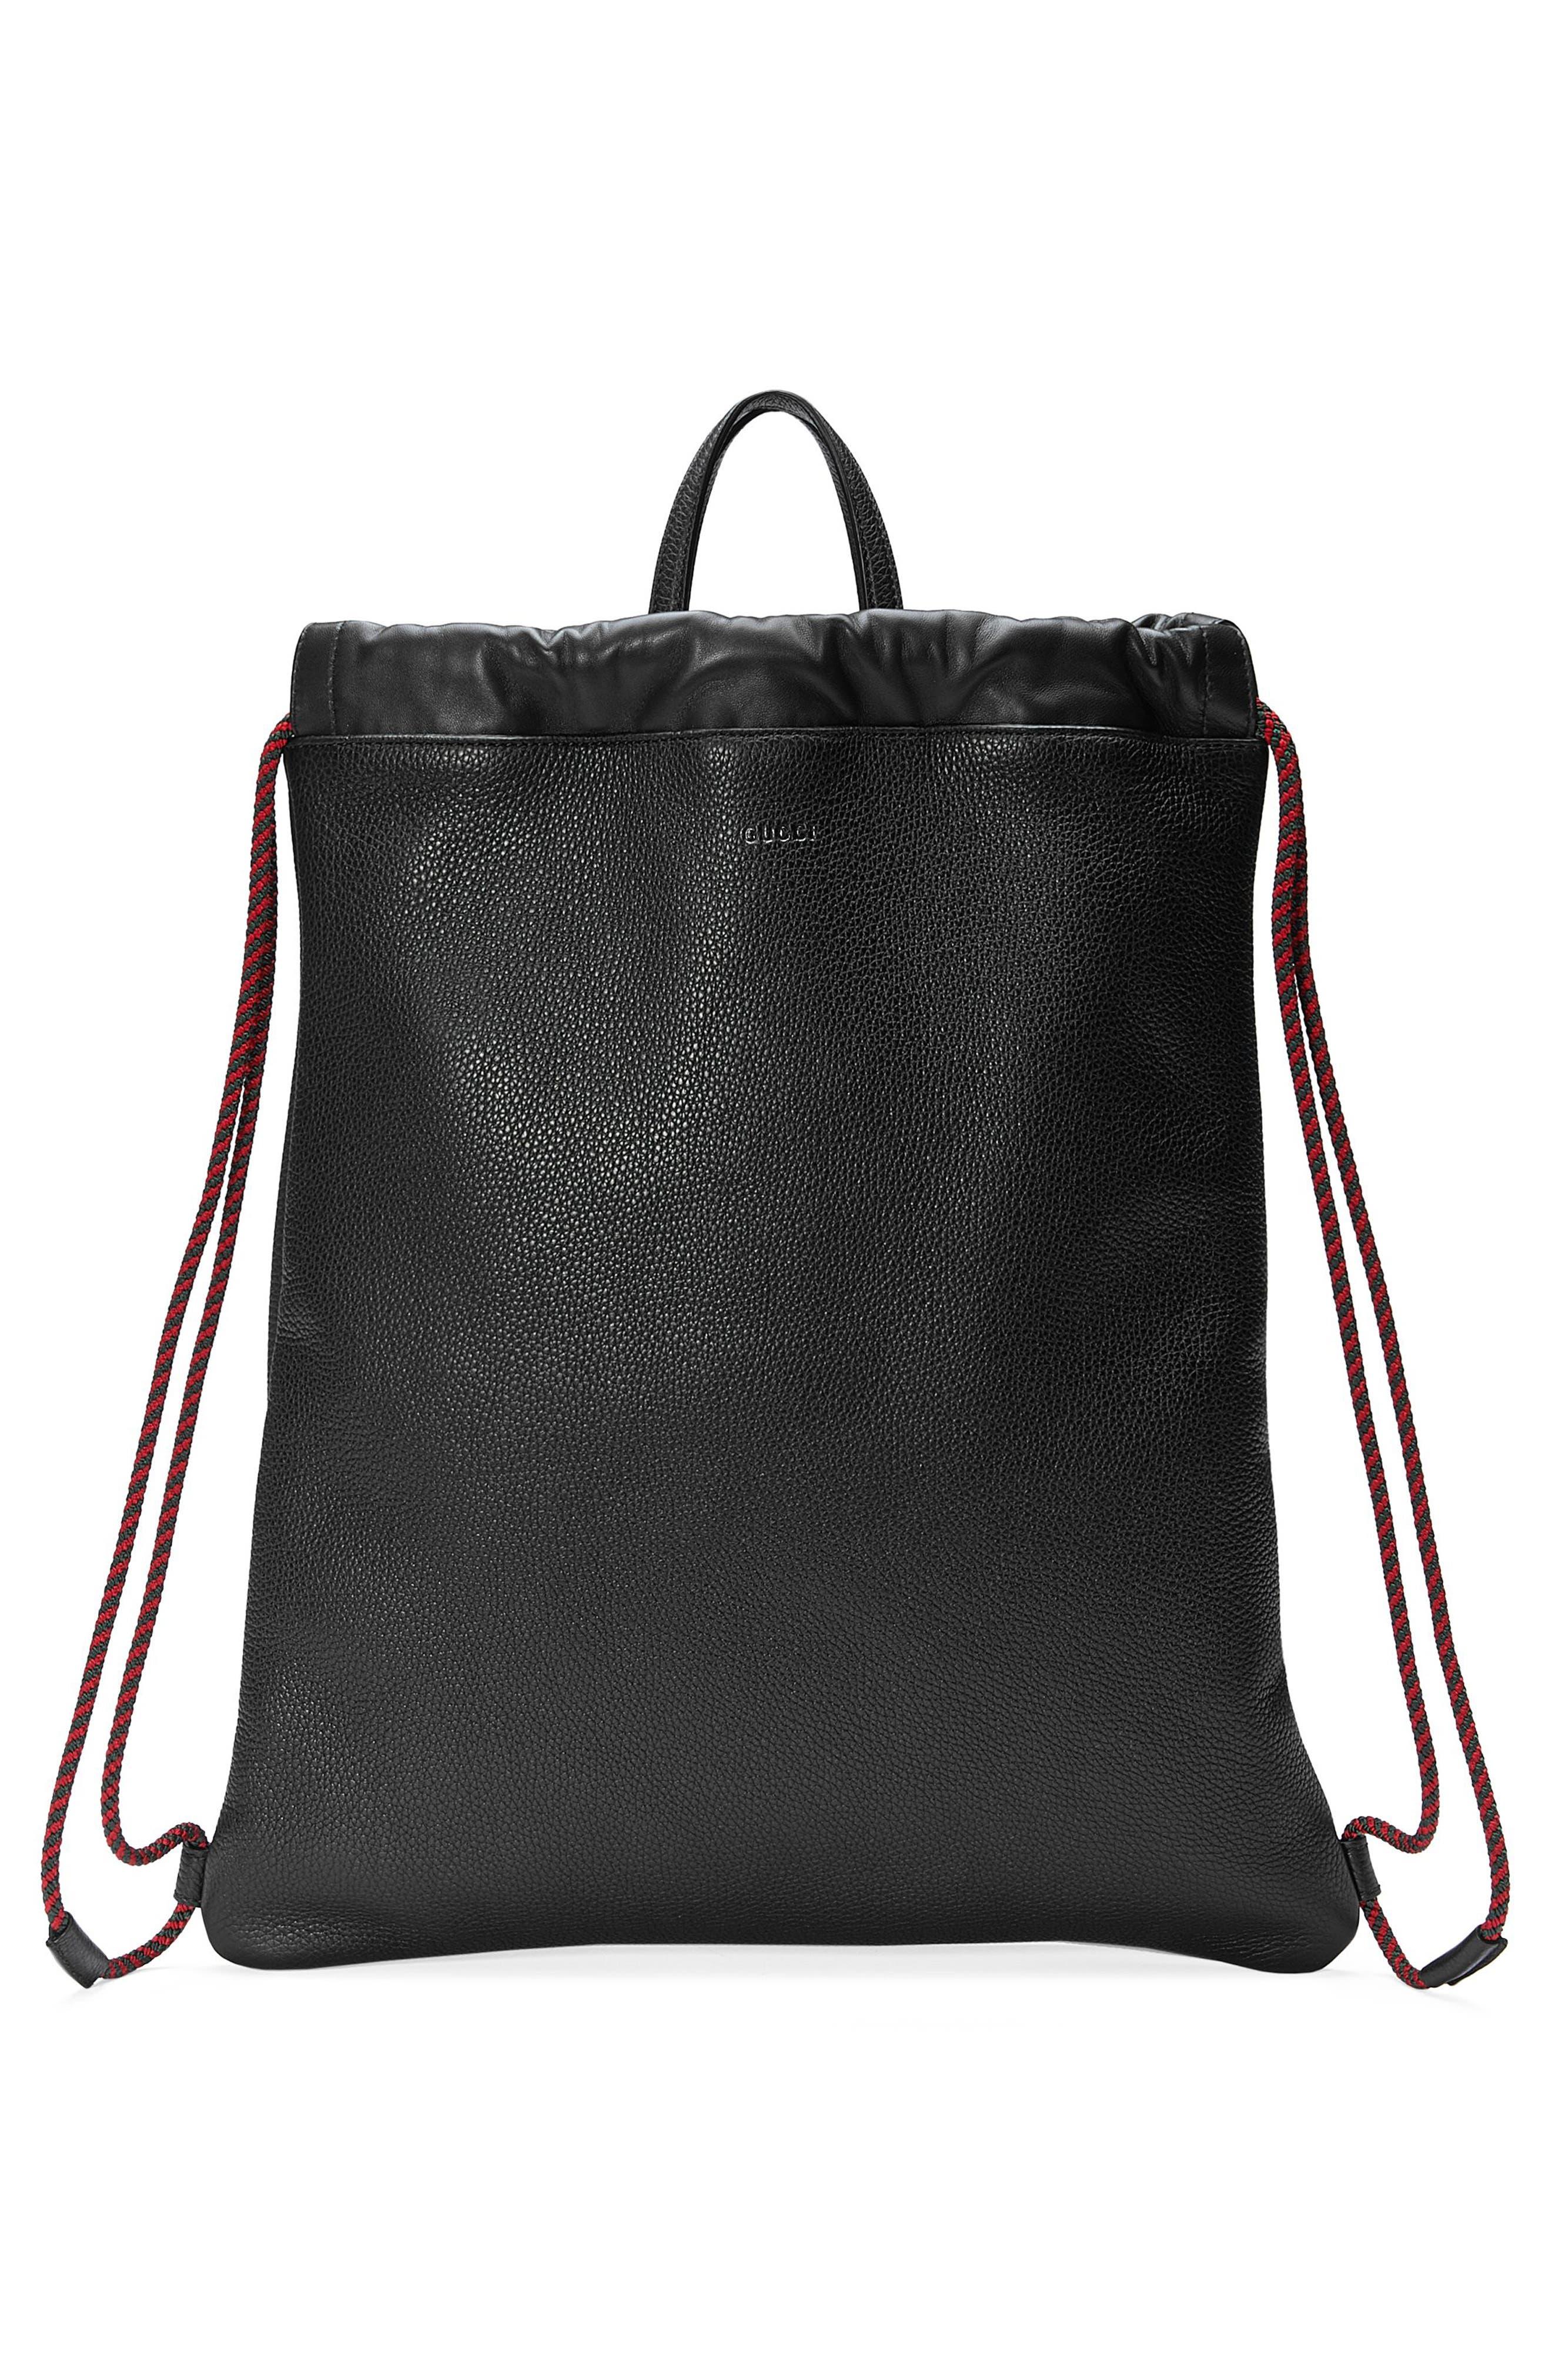 Gucci supreme belt bag ebay